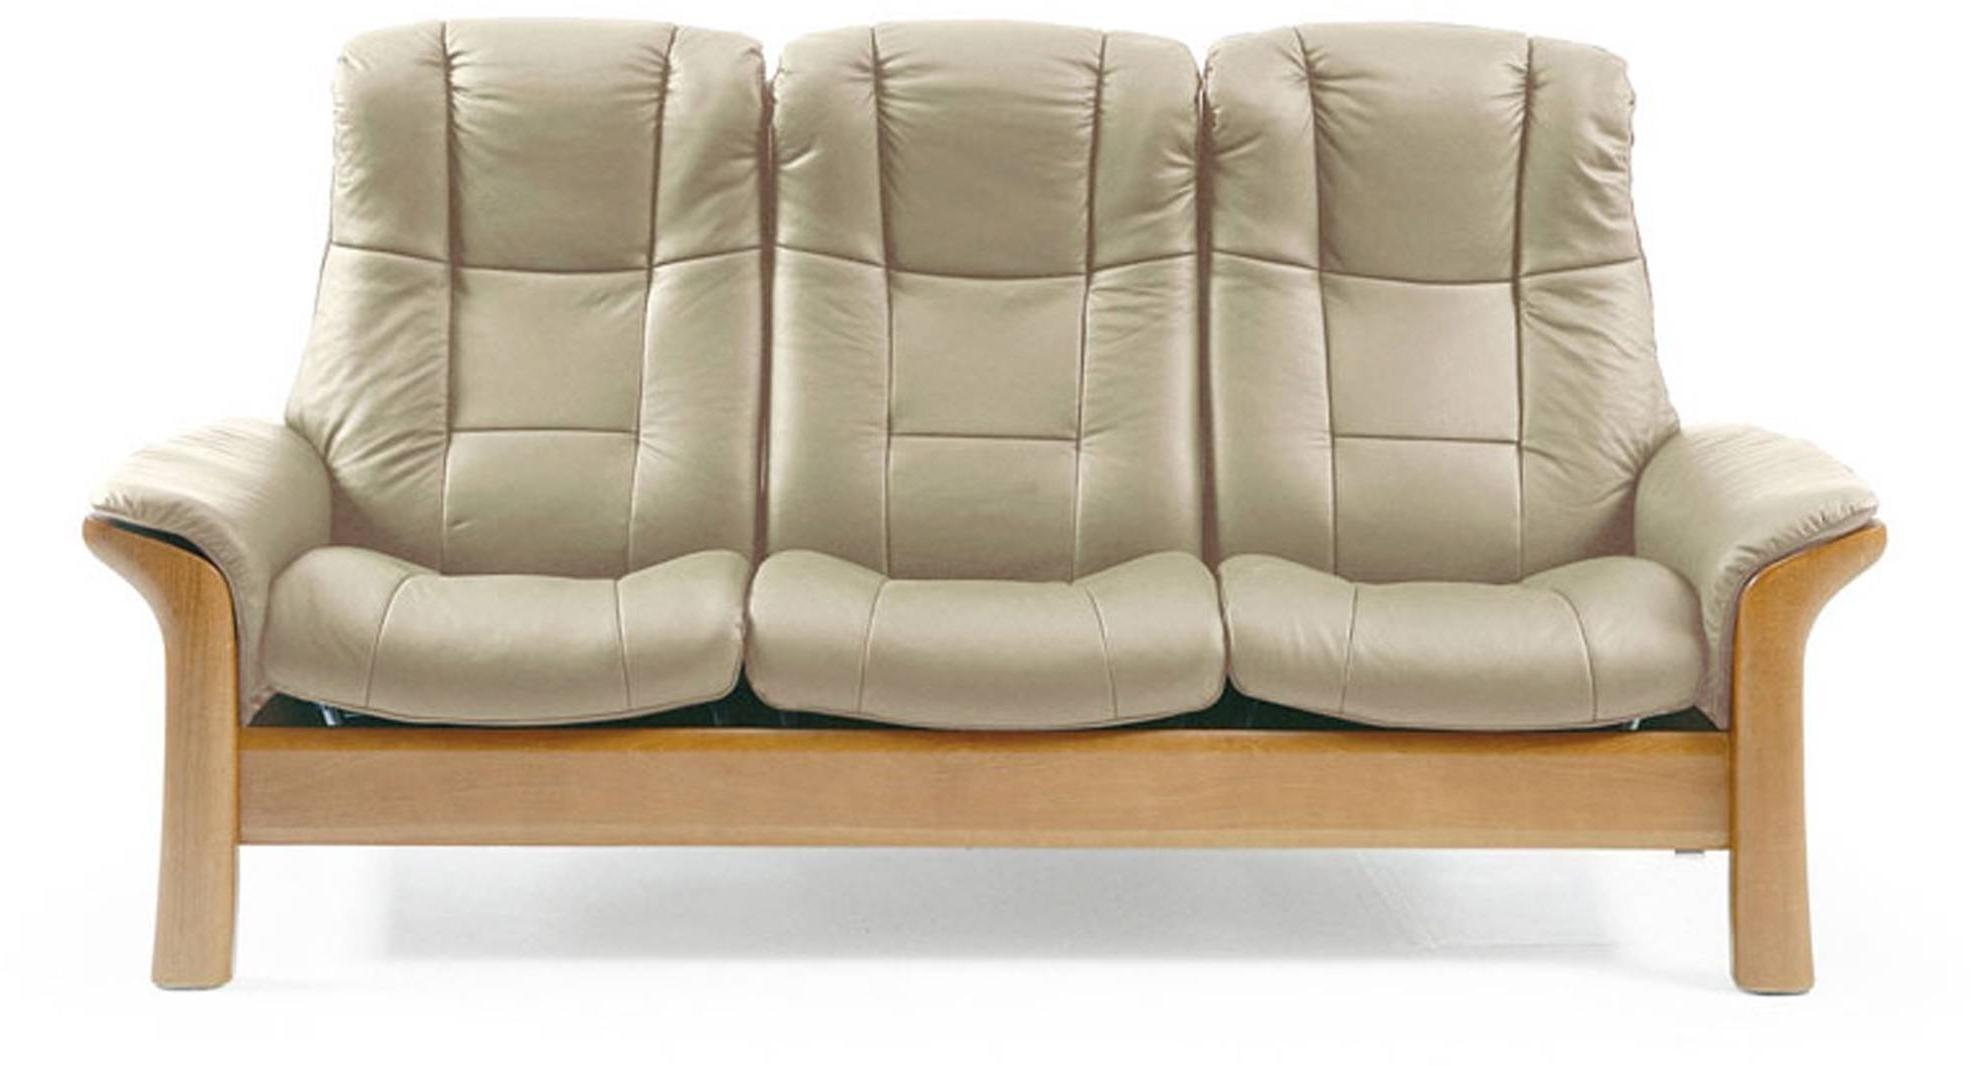 Favorite Stressless Windsor High Back 3 Seater Sofa – 3 Seater Sofas With Regard To Windsor Sofas (View 4 of 20)